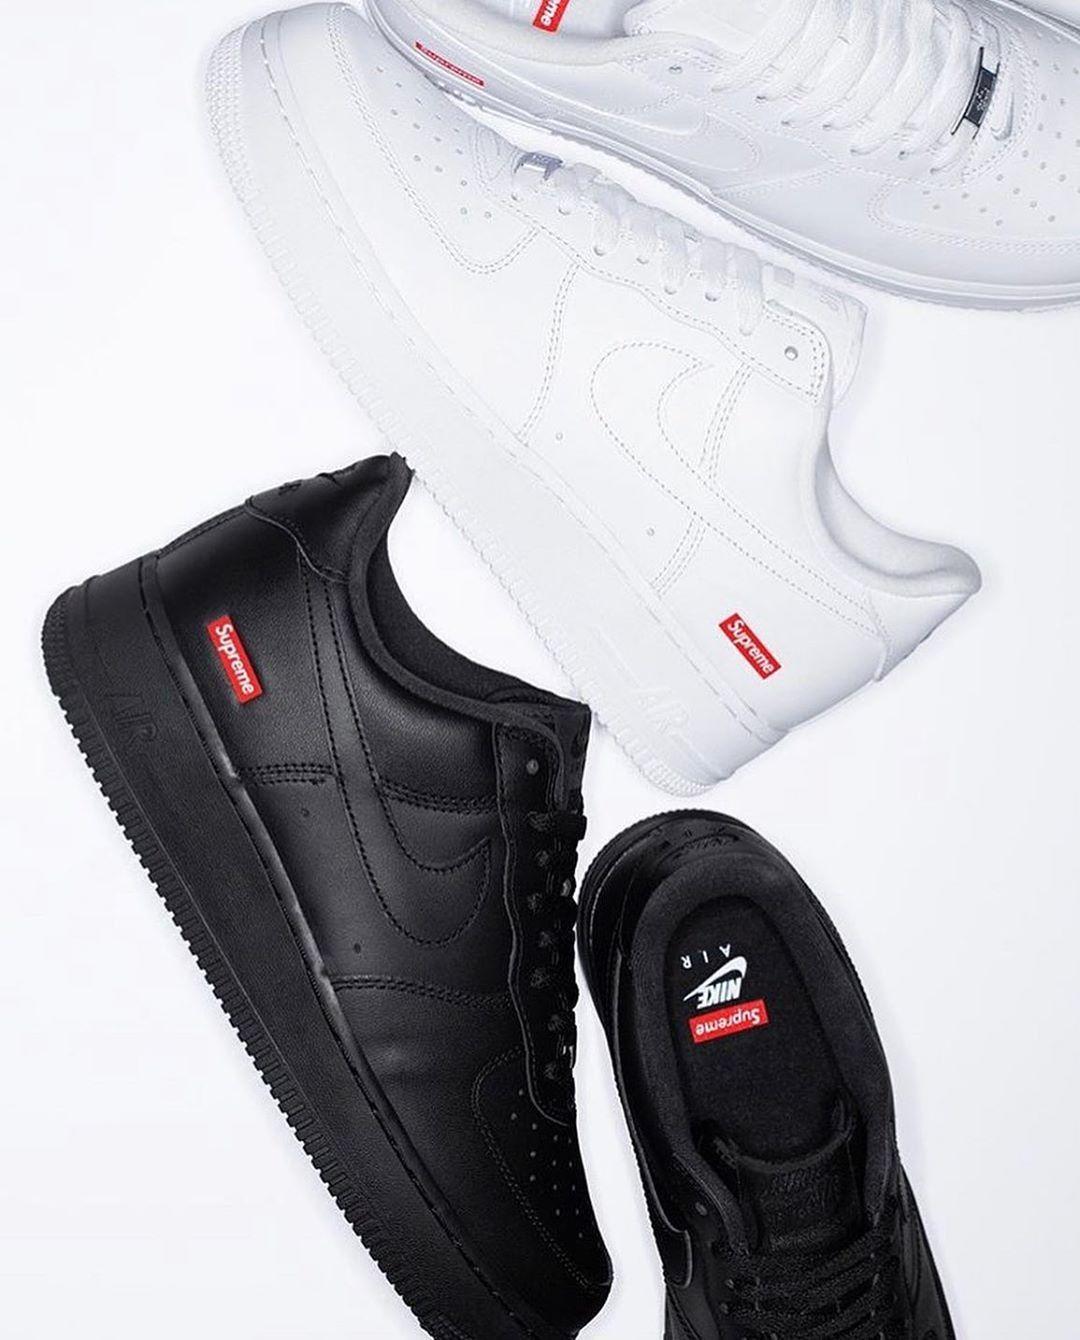 shoes websites; shoes nike; shoes